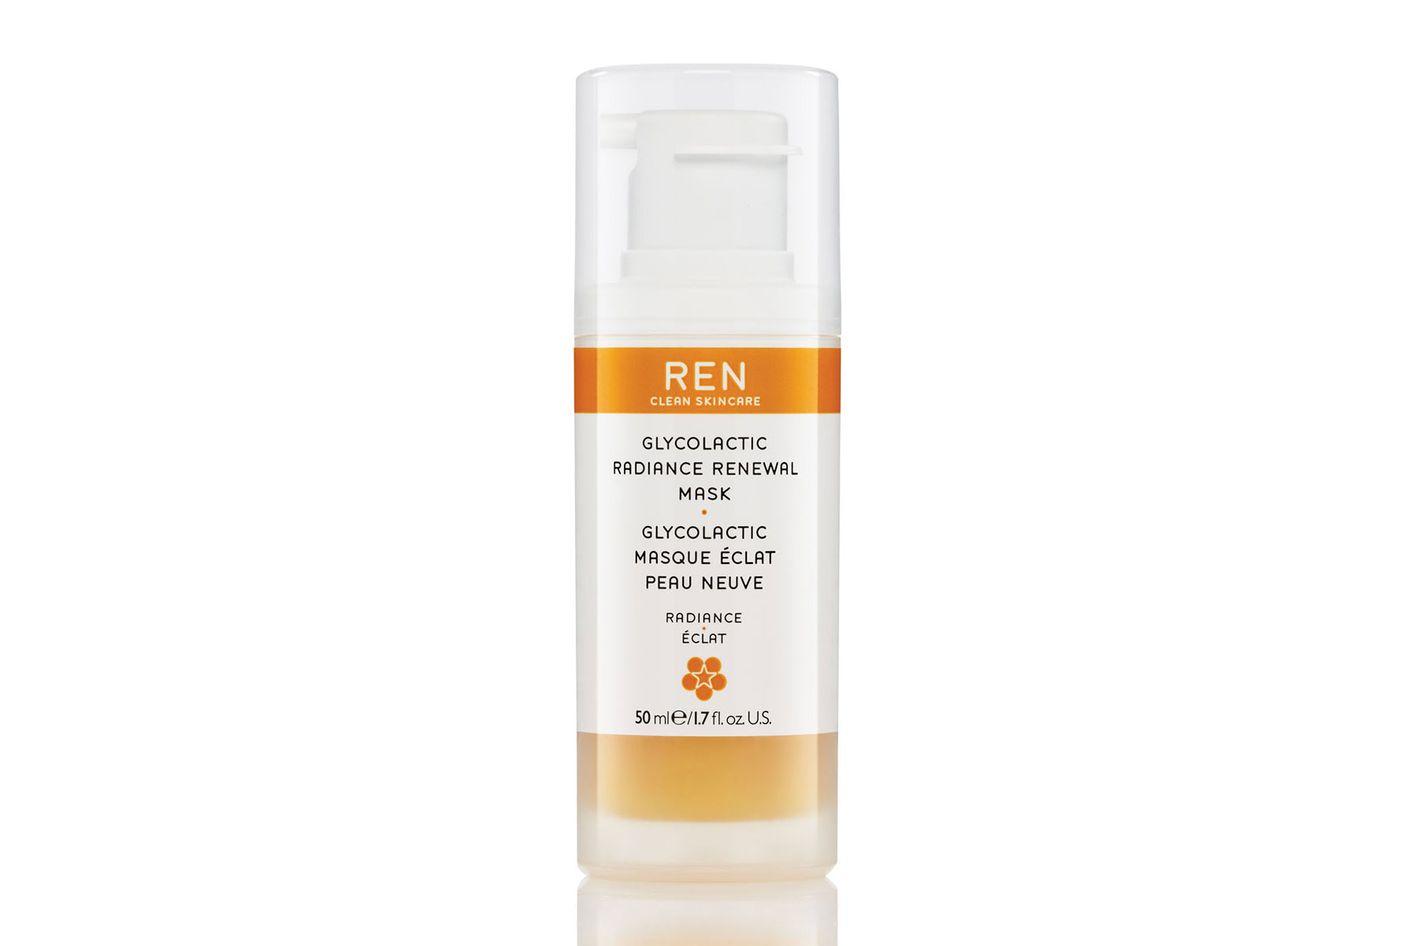 Ren Glycol Lactic Radiance Renewal Mask